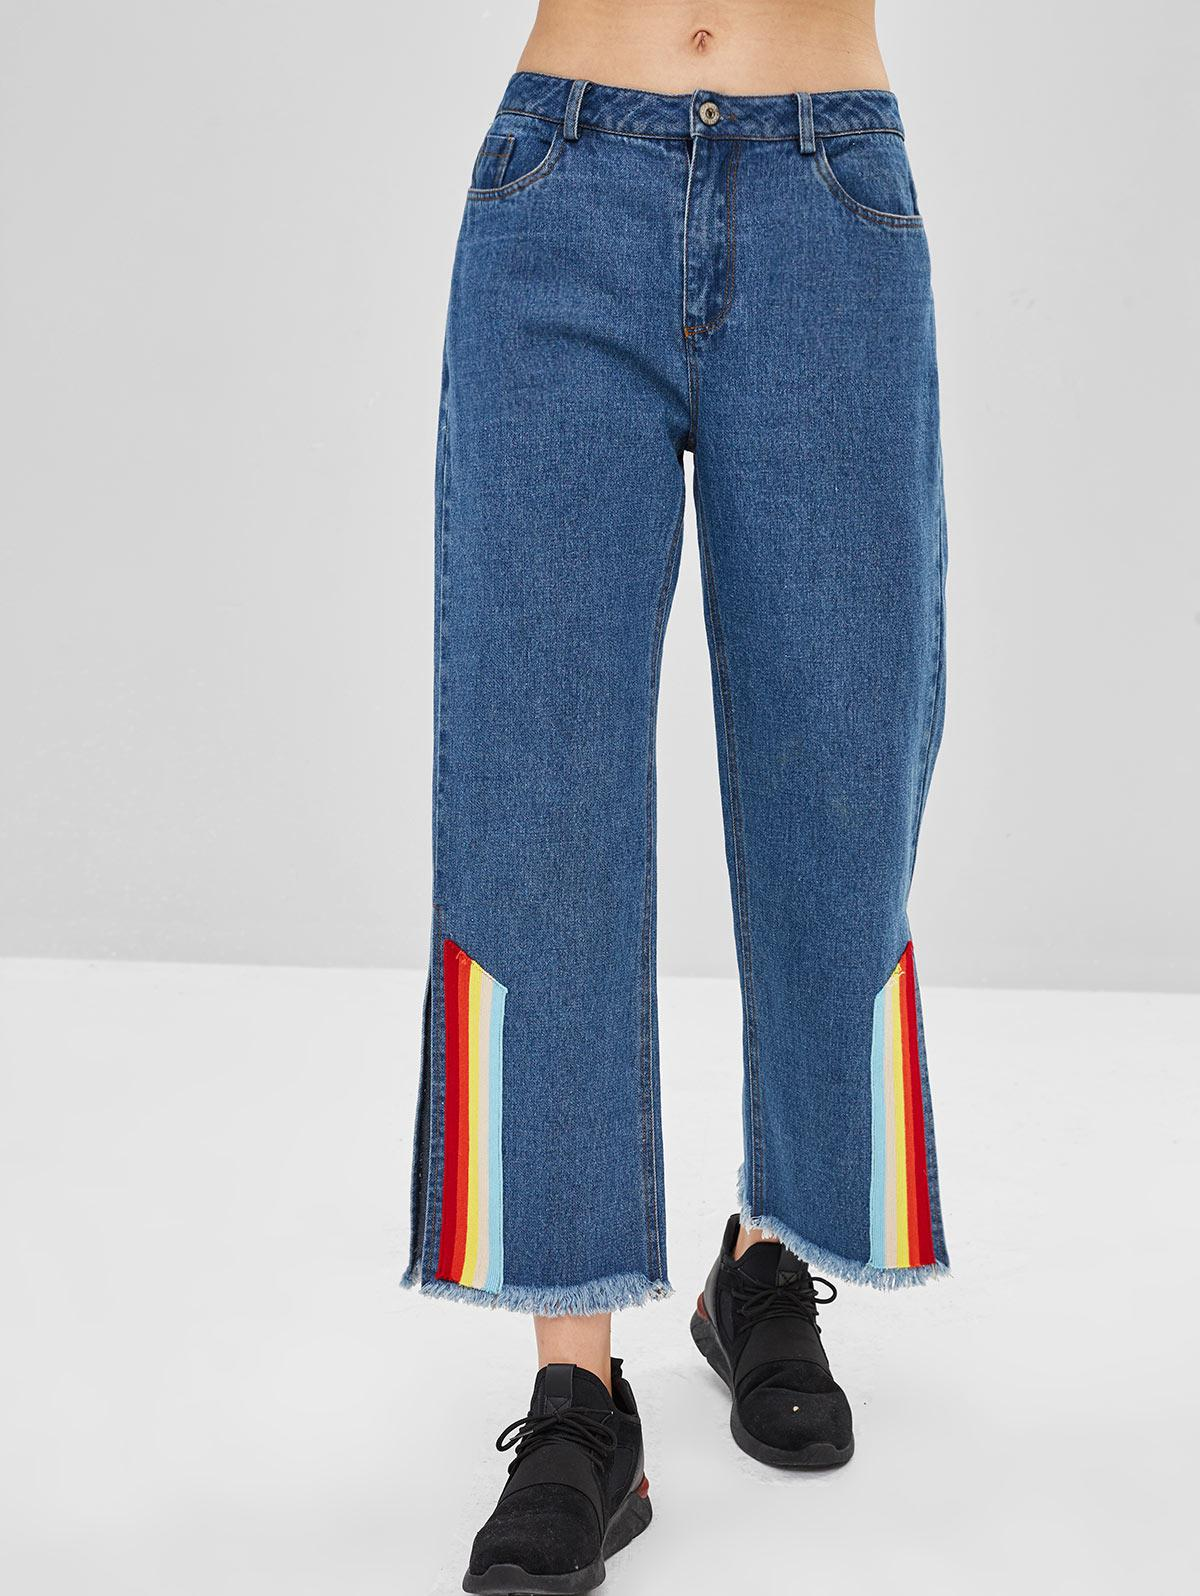 ZAFUL Rainbow Striped Slit Wide Leg Jeans